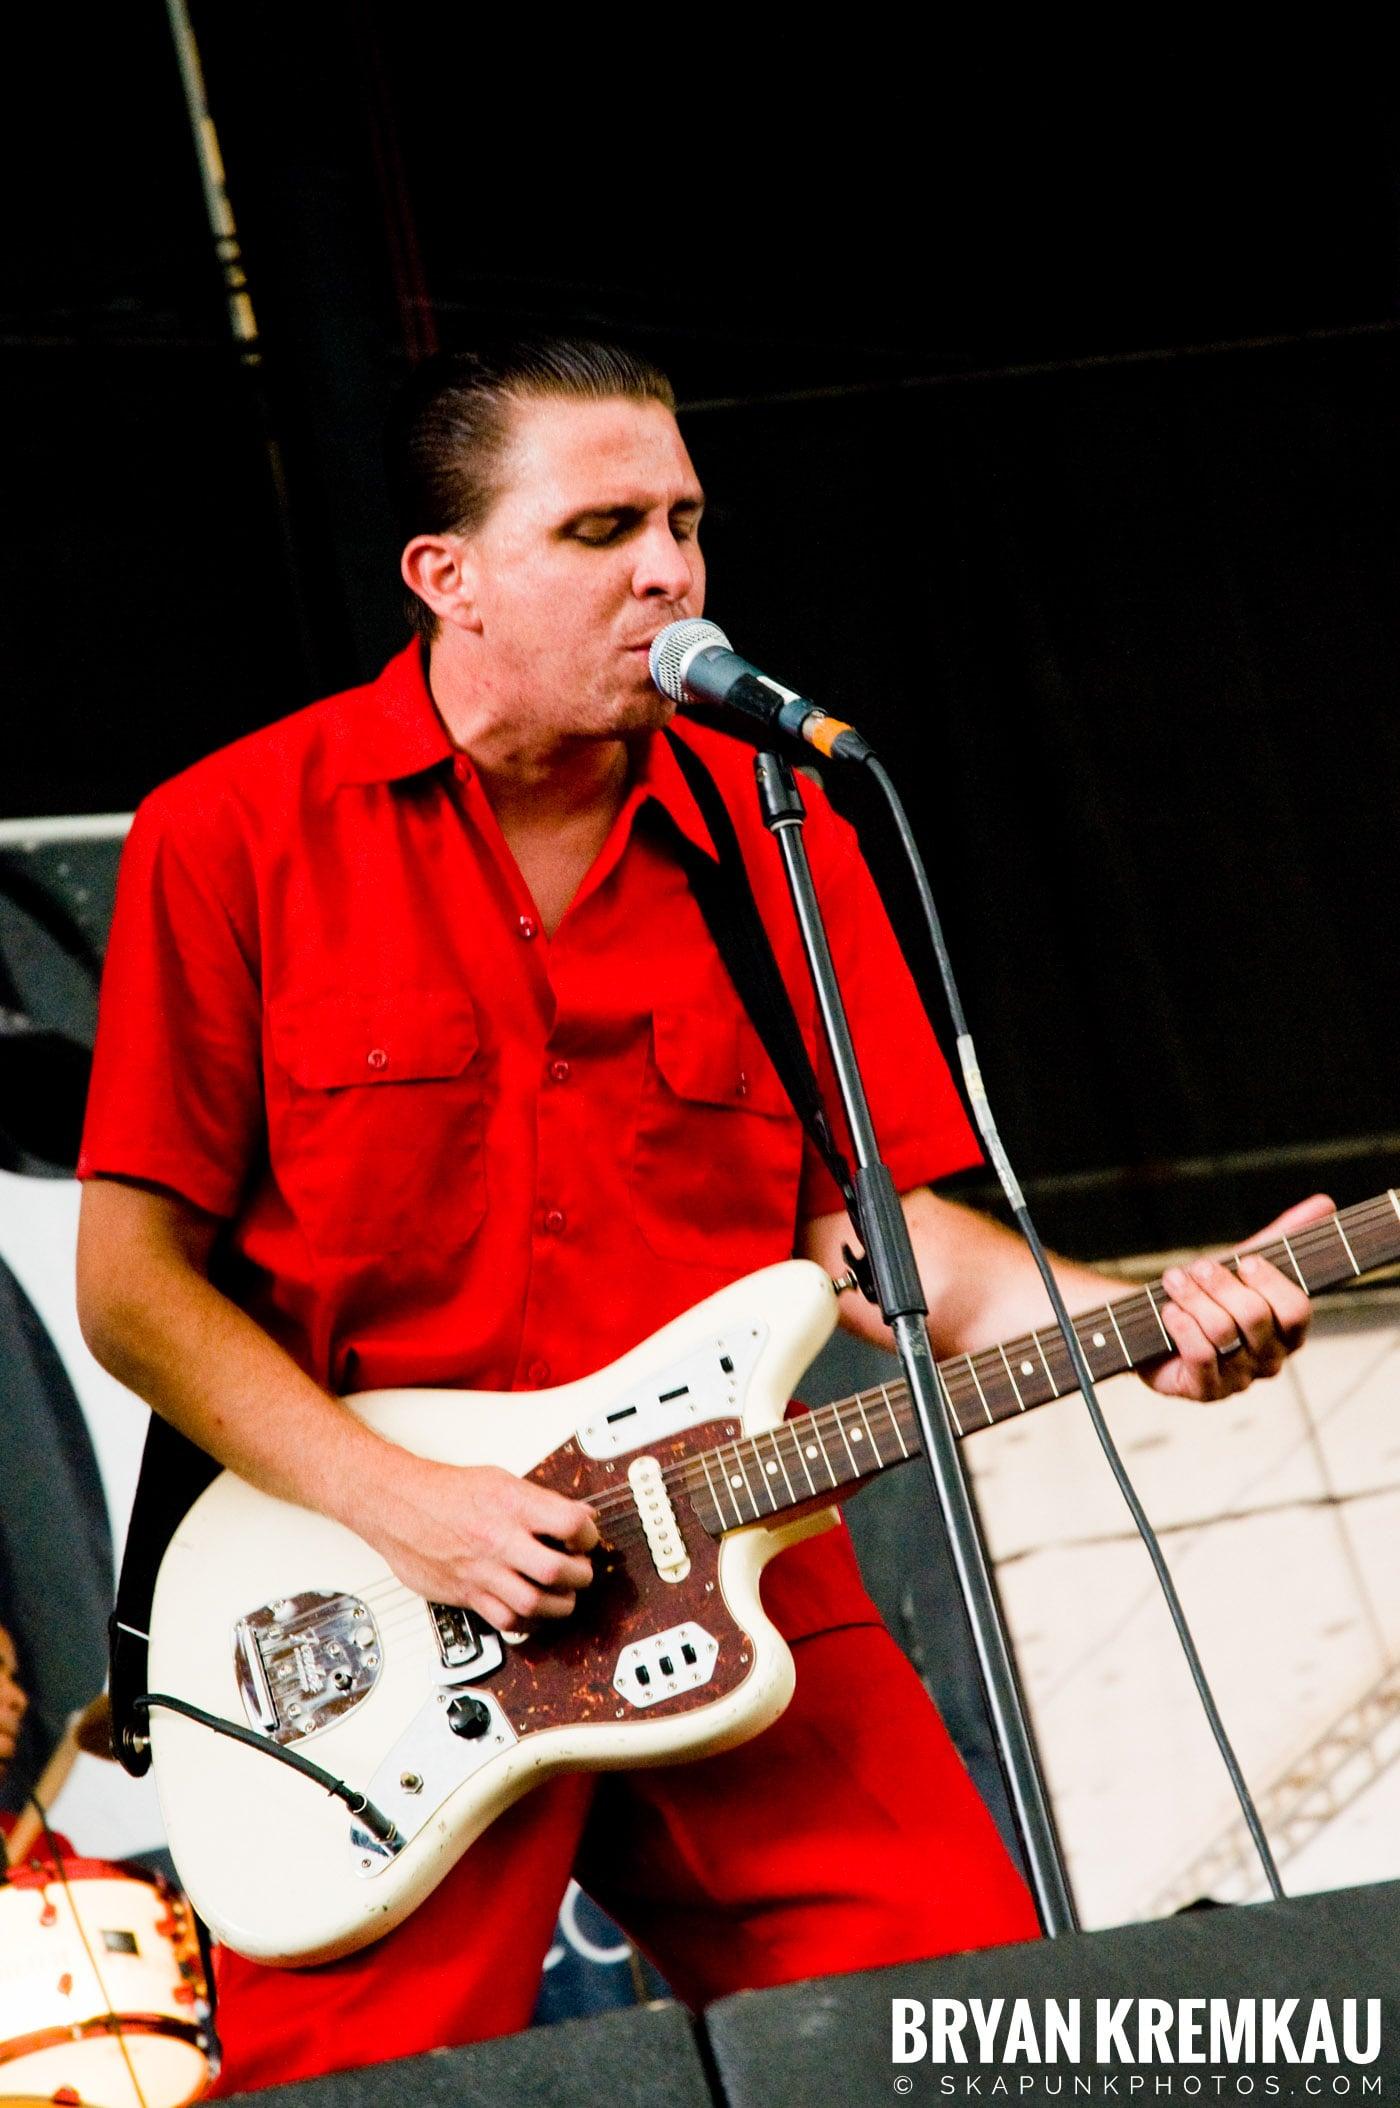 The Aggrolites @ Warped Tour 08, Scranton PA - 7.27.08 (14)